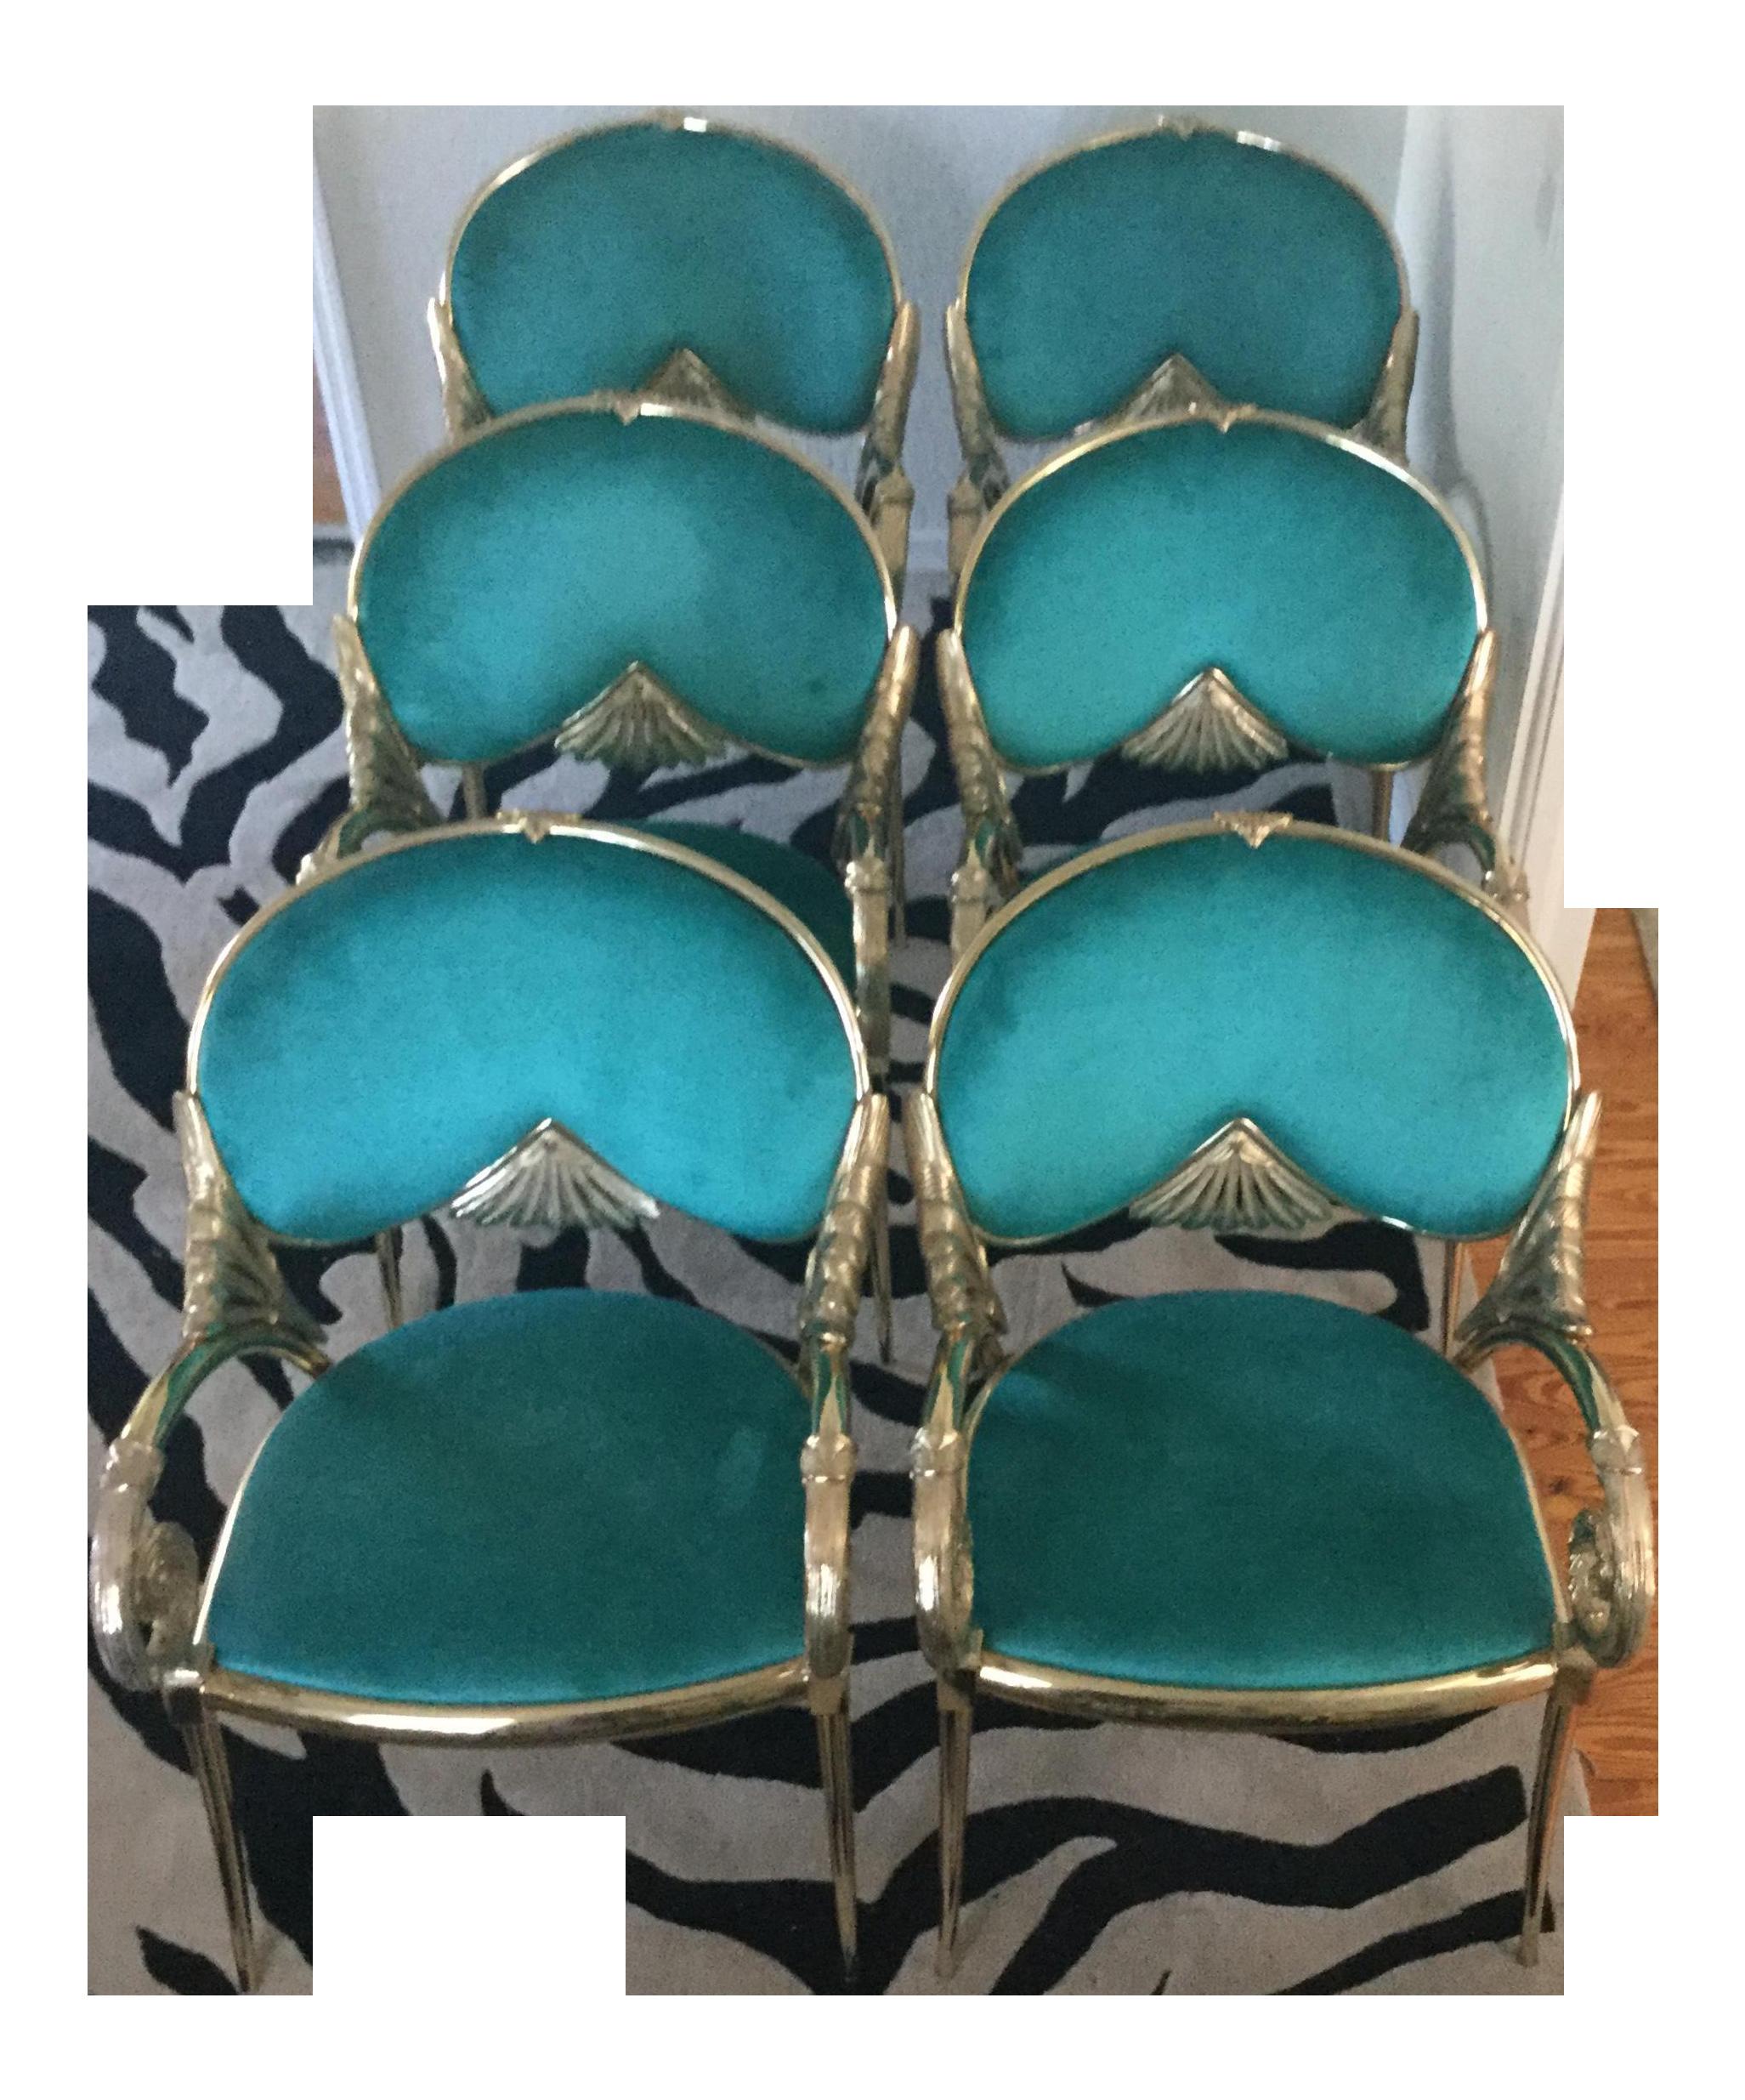 Tampa Vintage, Antique & Used Furniture | Chairish